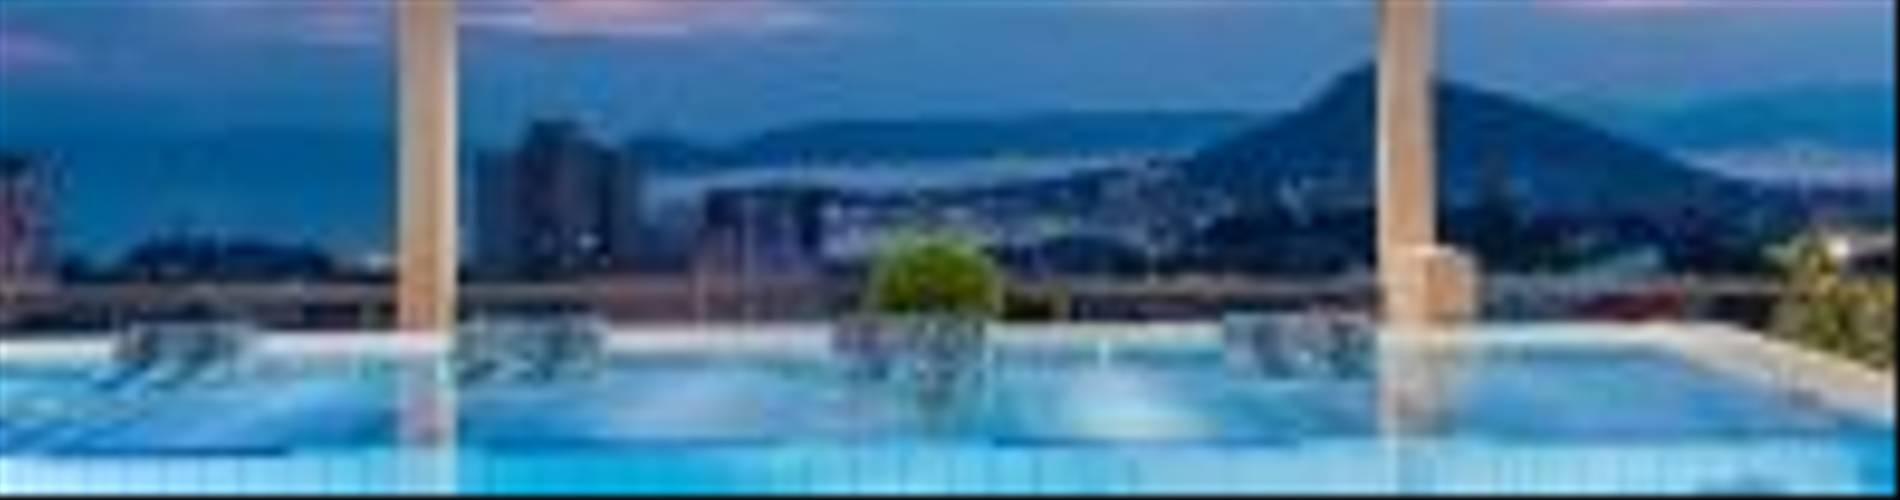 HotelResidence_DIOKLECIJAN_rooftop-pool-night-panorama-wide_2048px_3S8C1748-198x120.jpg